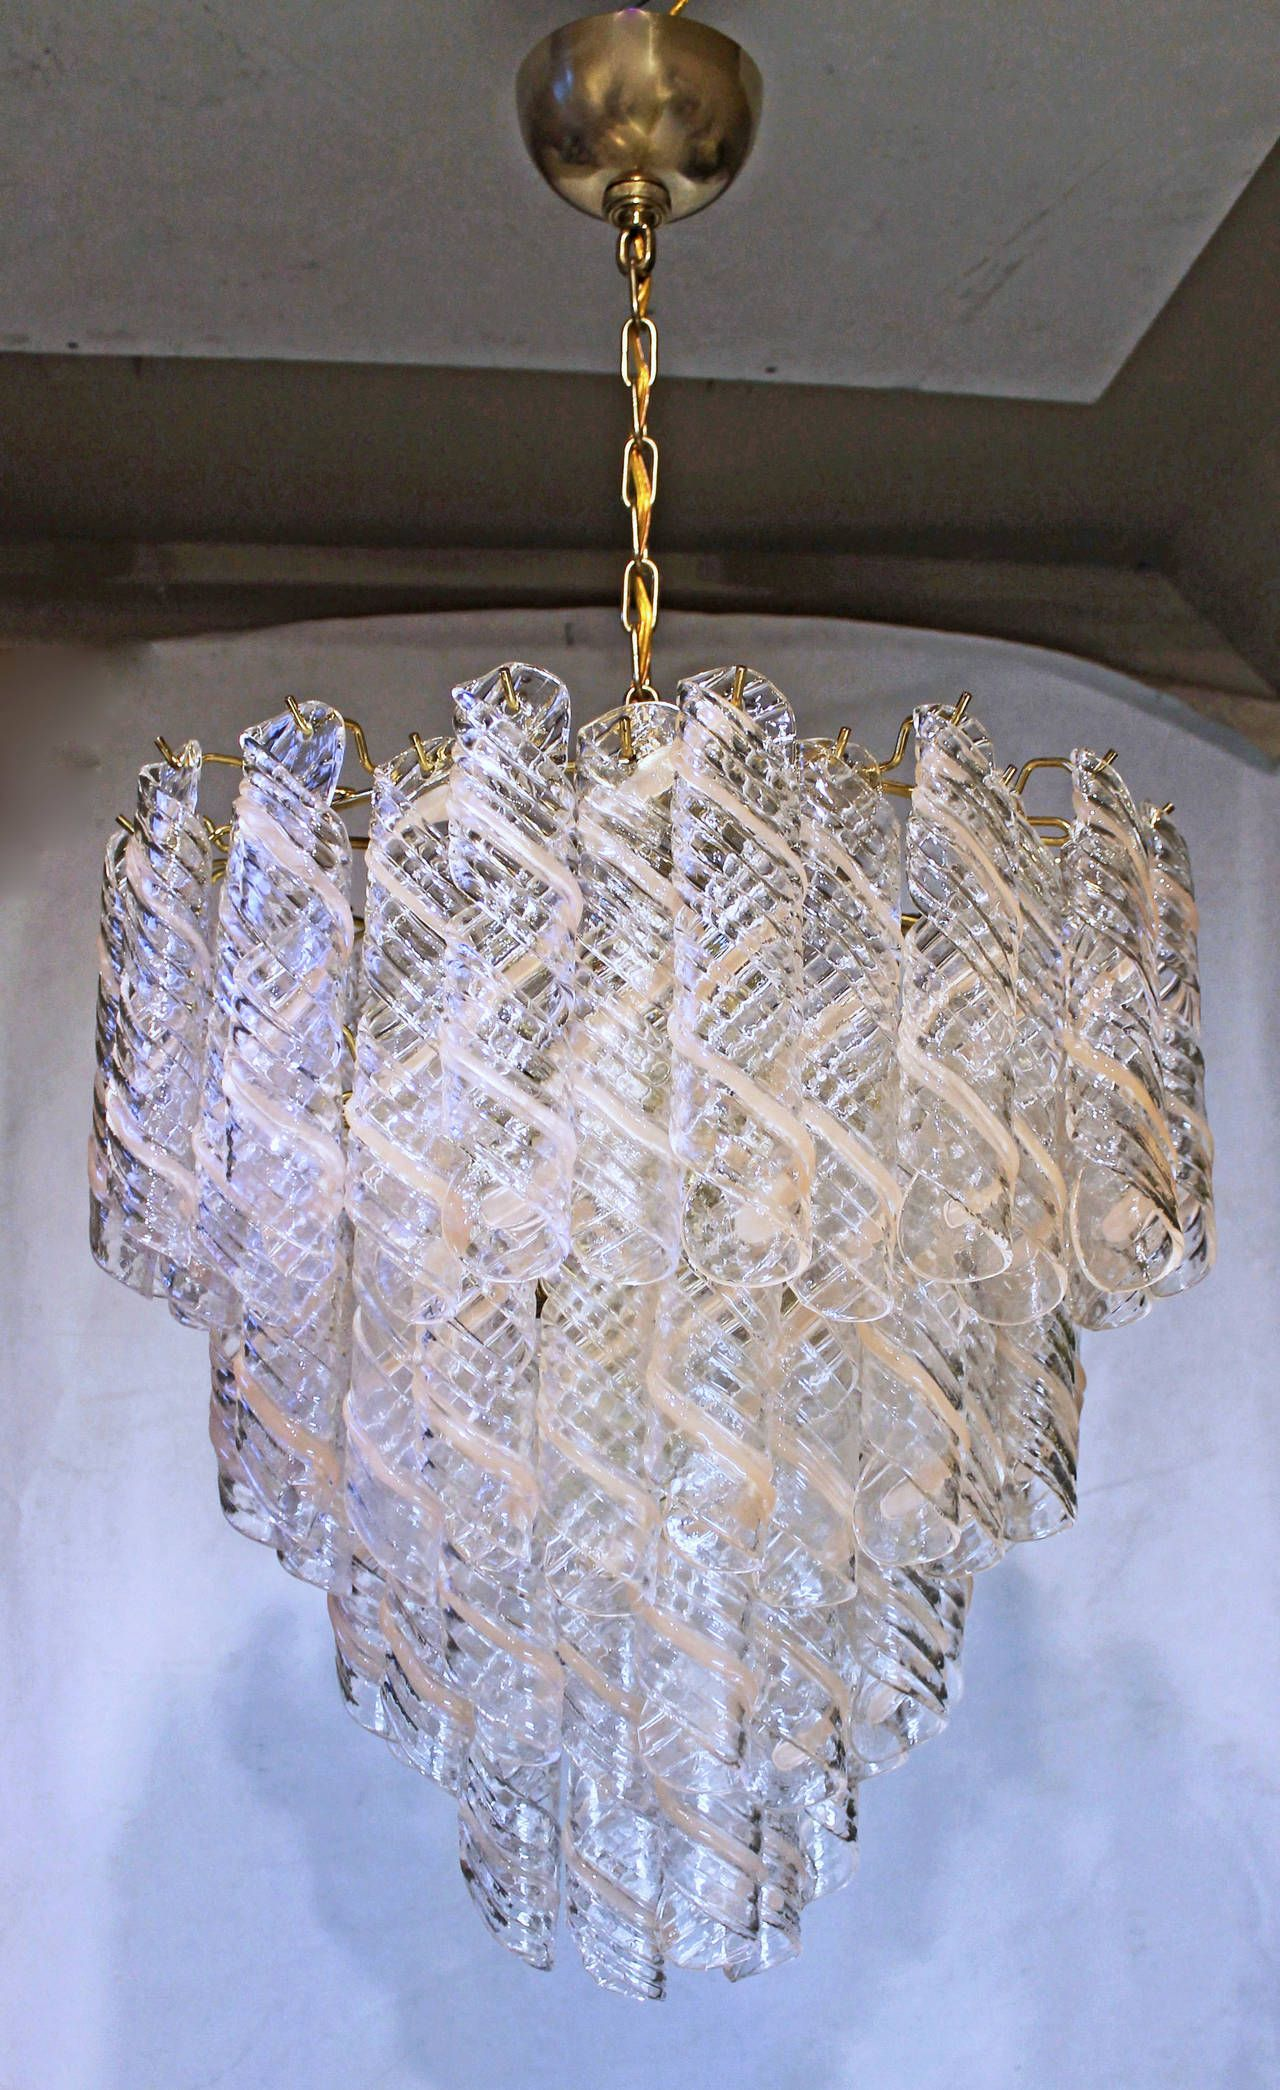 Italian Mazzega Style Murano Swirled Glass Chandelier  Trendy decoration 1000euro